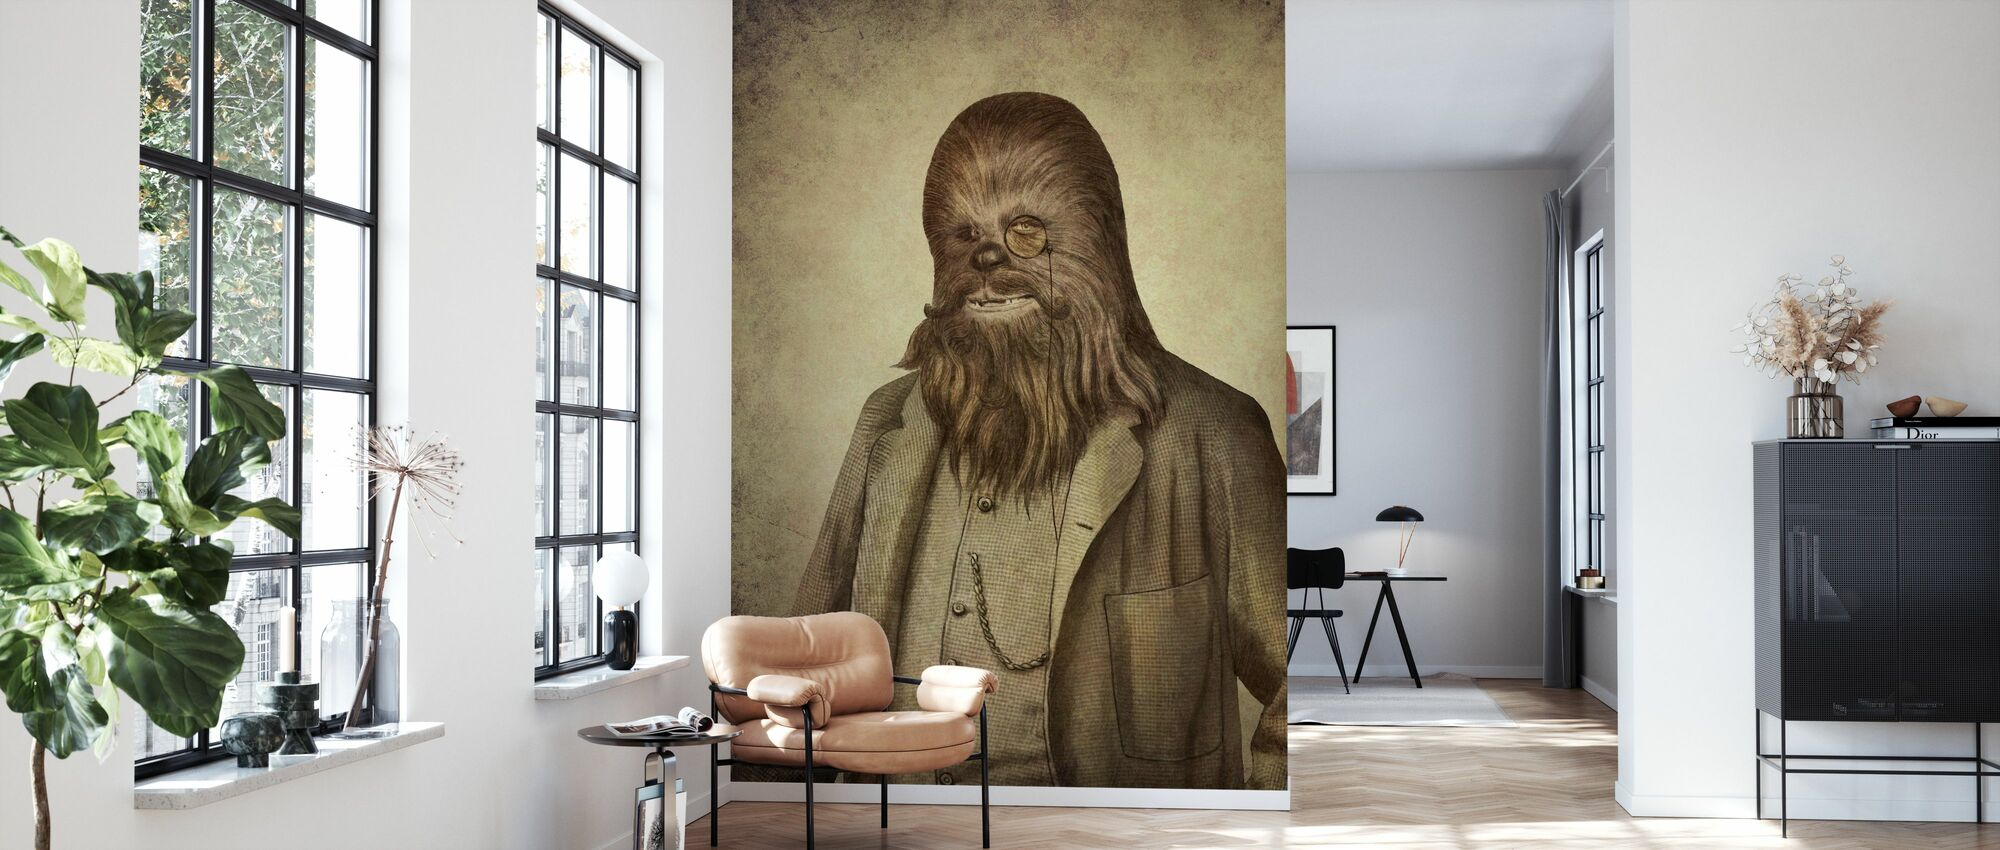 Victorian Wars Chancellor Chewman - Wallpaper - Living Room